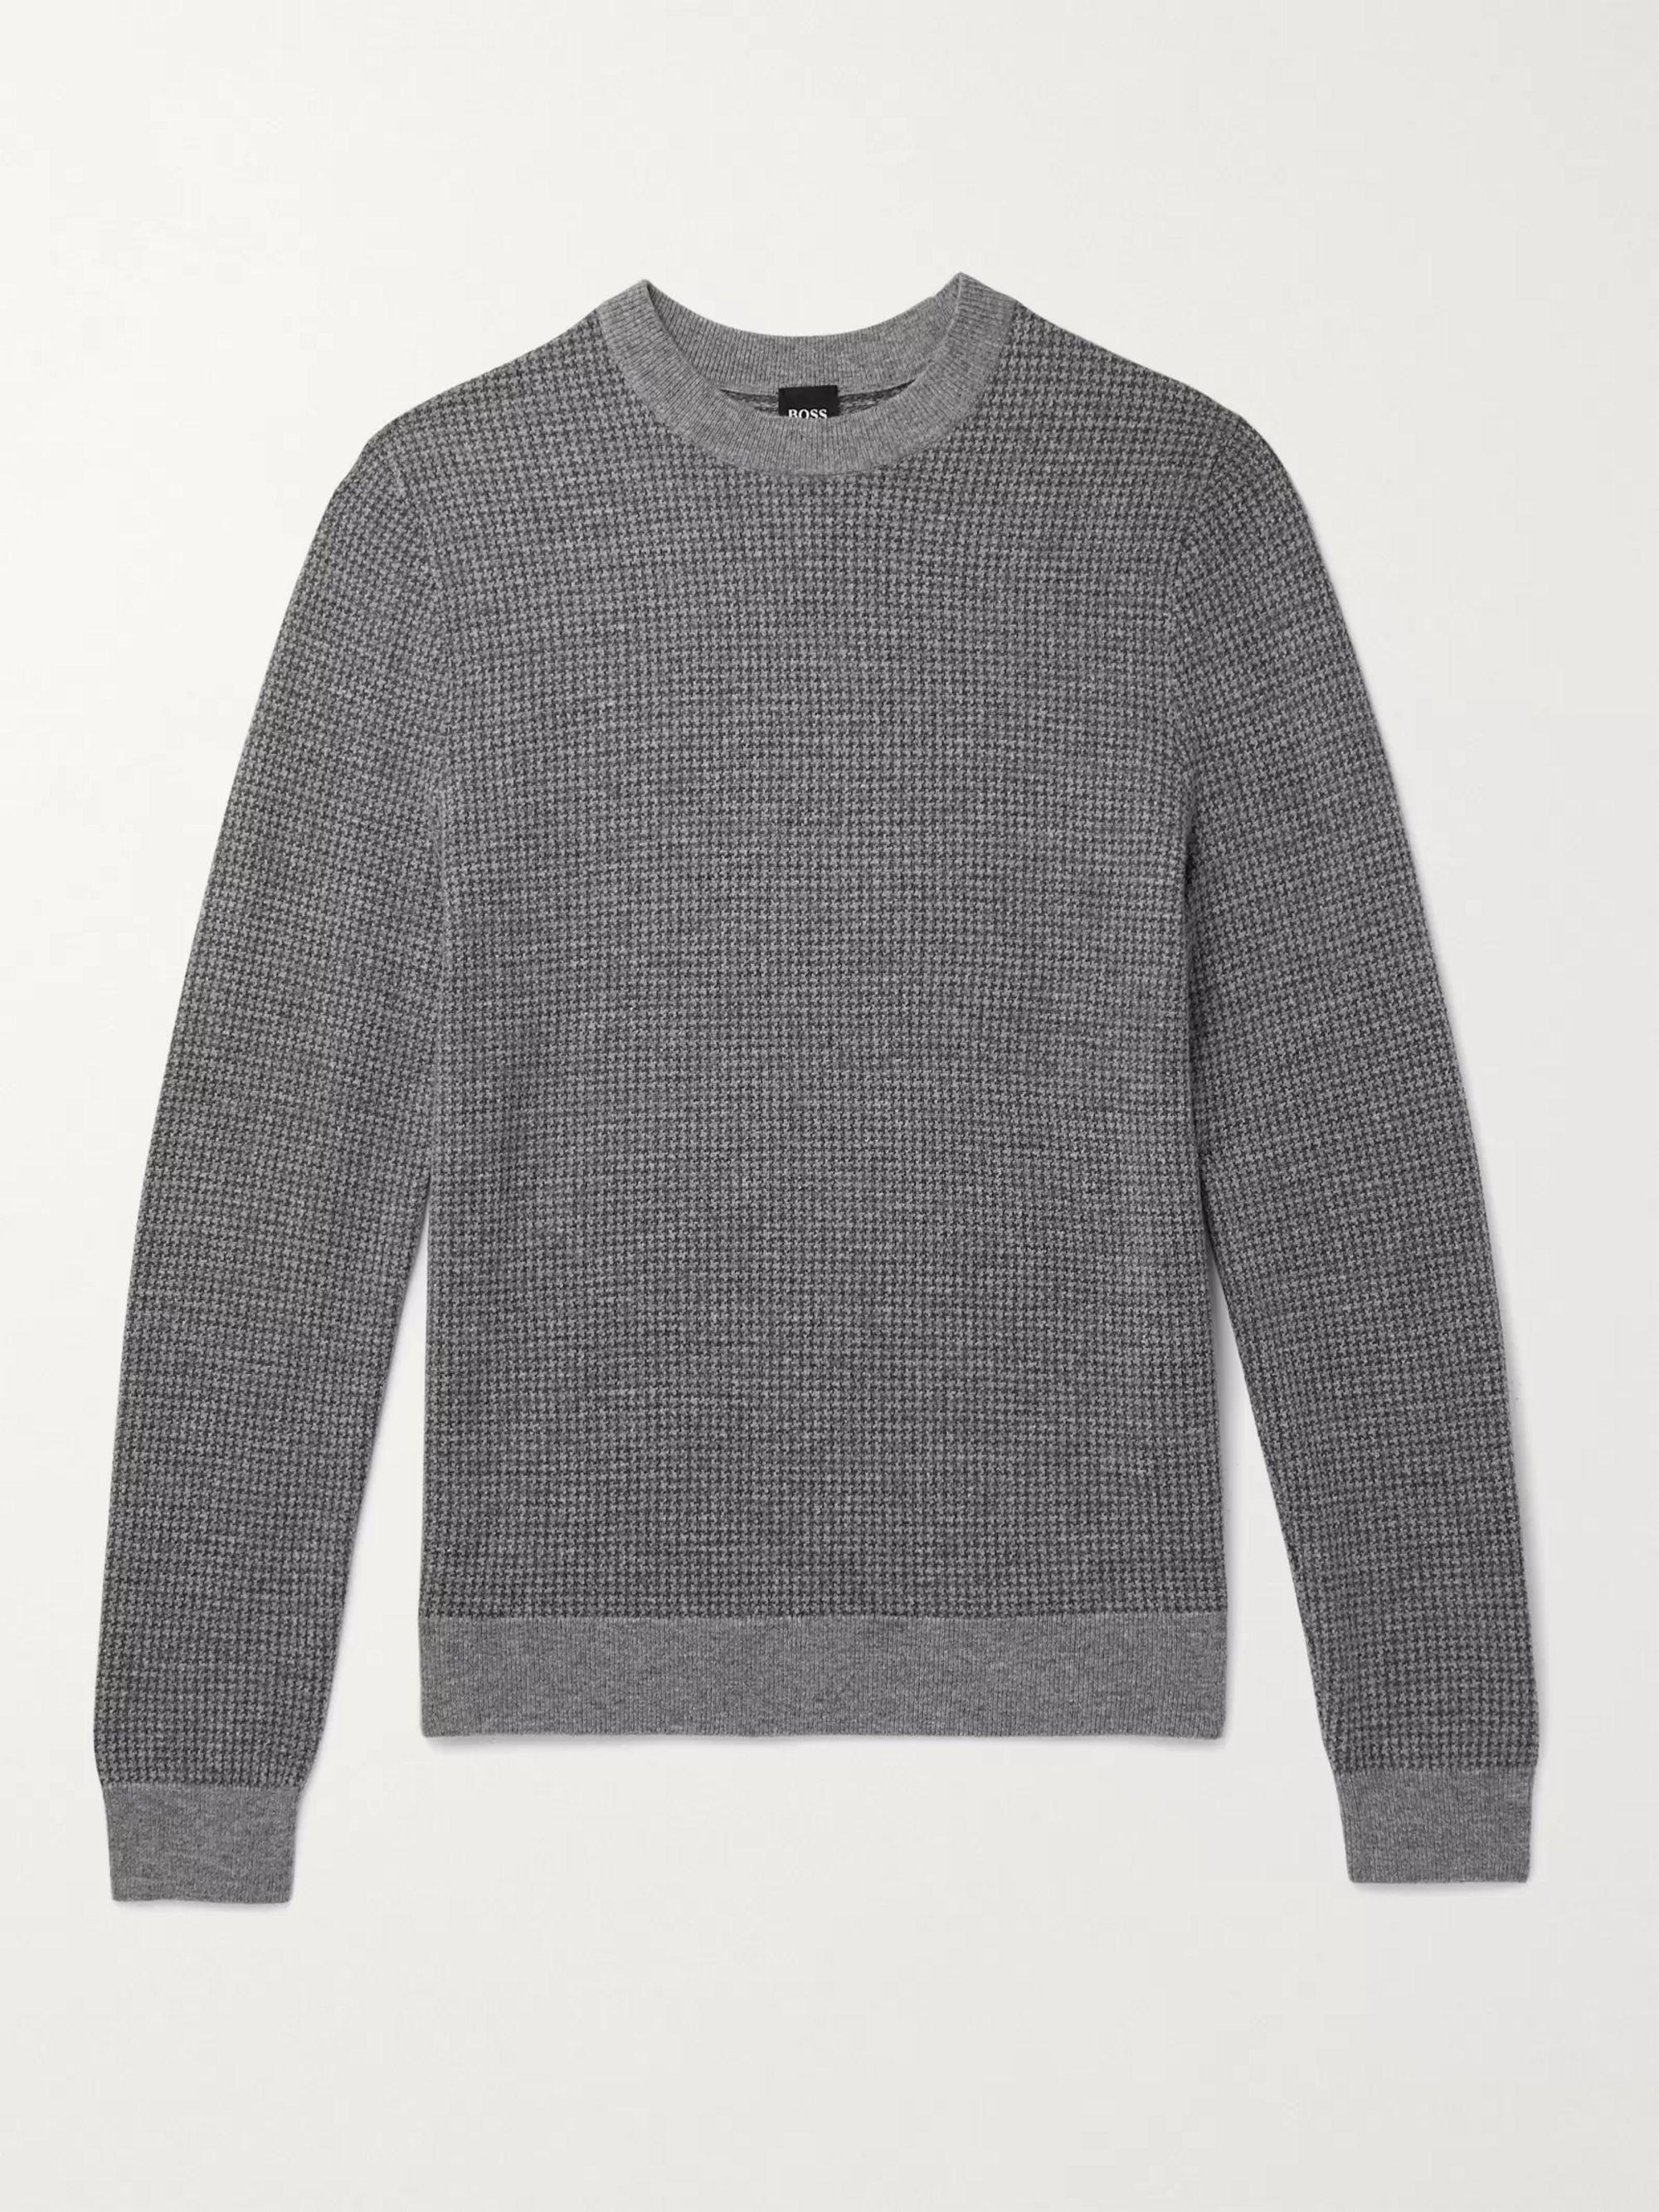 HUGO BOSS Maddeo Slim-Fit Houndstooth Virgin Wool Sweater